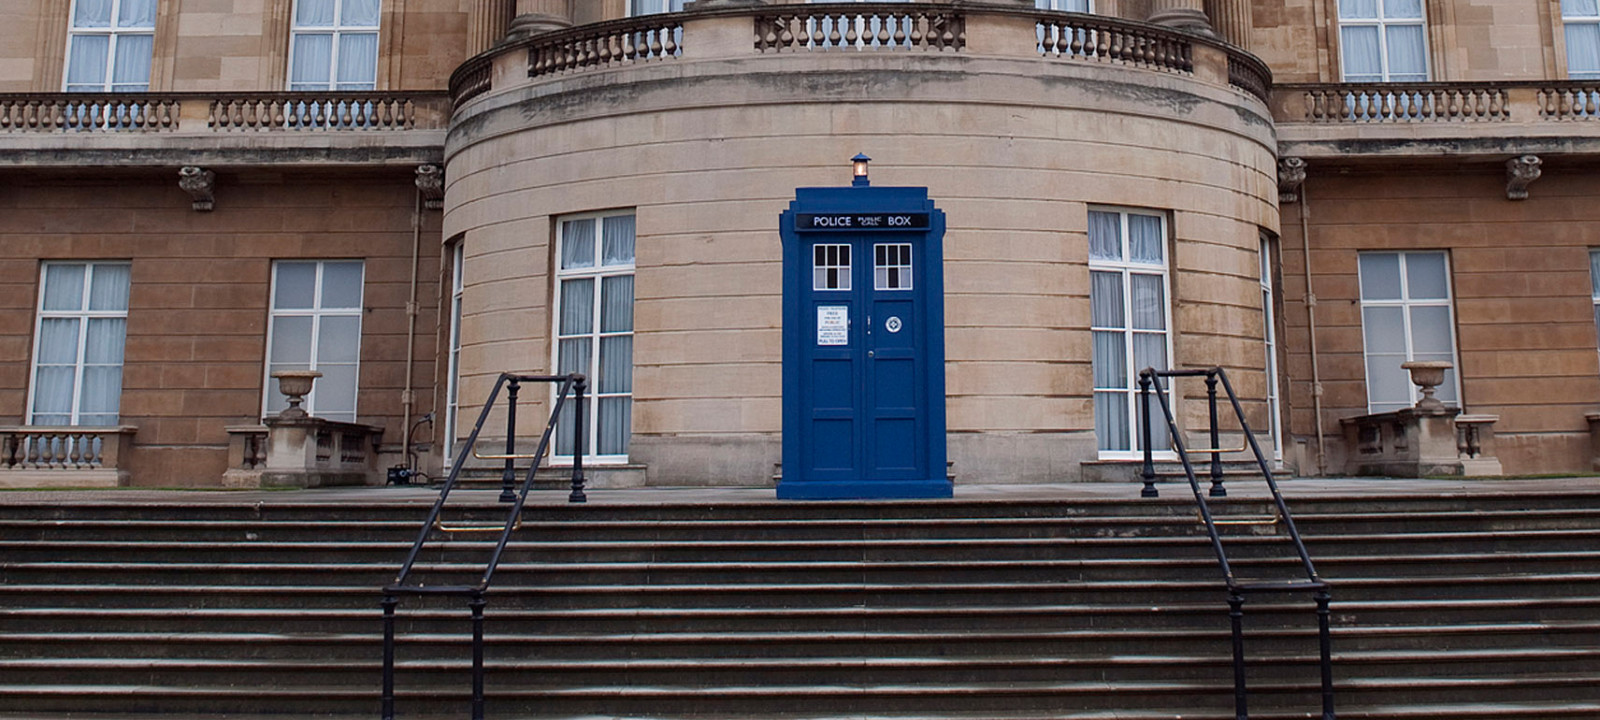 The TARDIS at Buckingham Palace, 2013 (Photo: Eddie Mulholland / Getty Images)